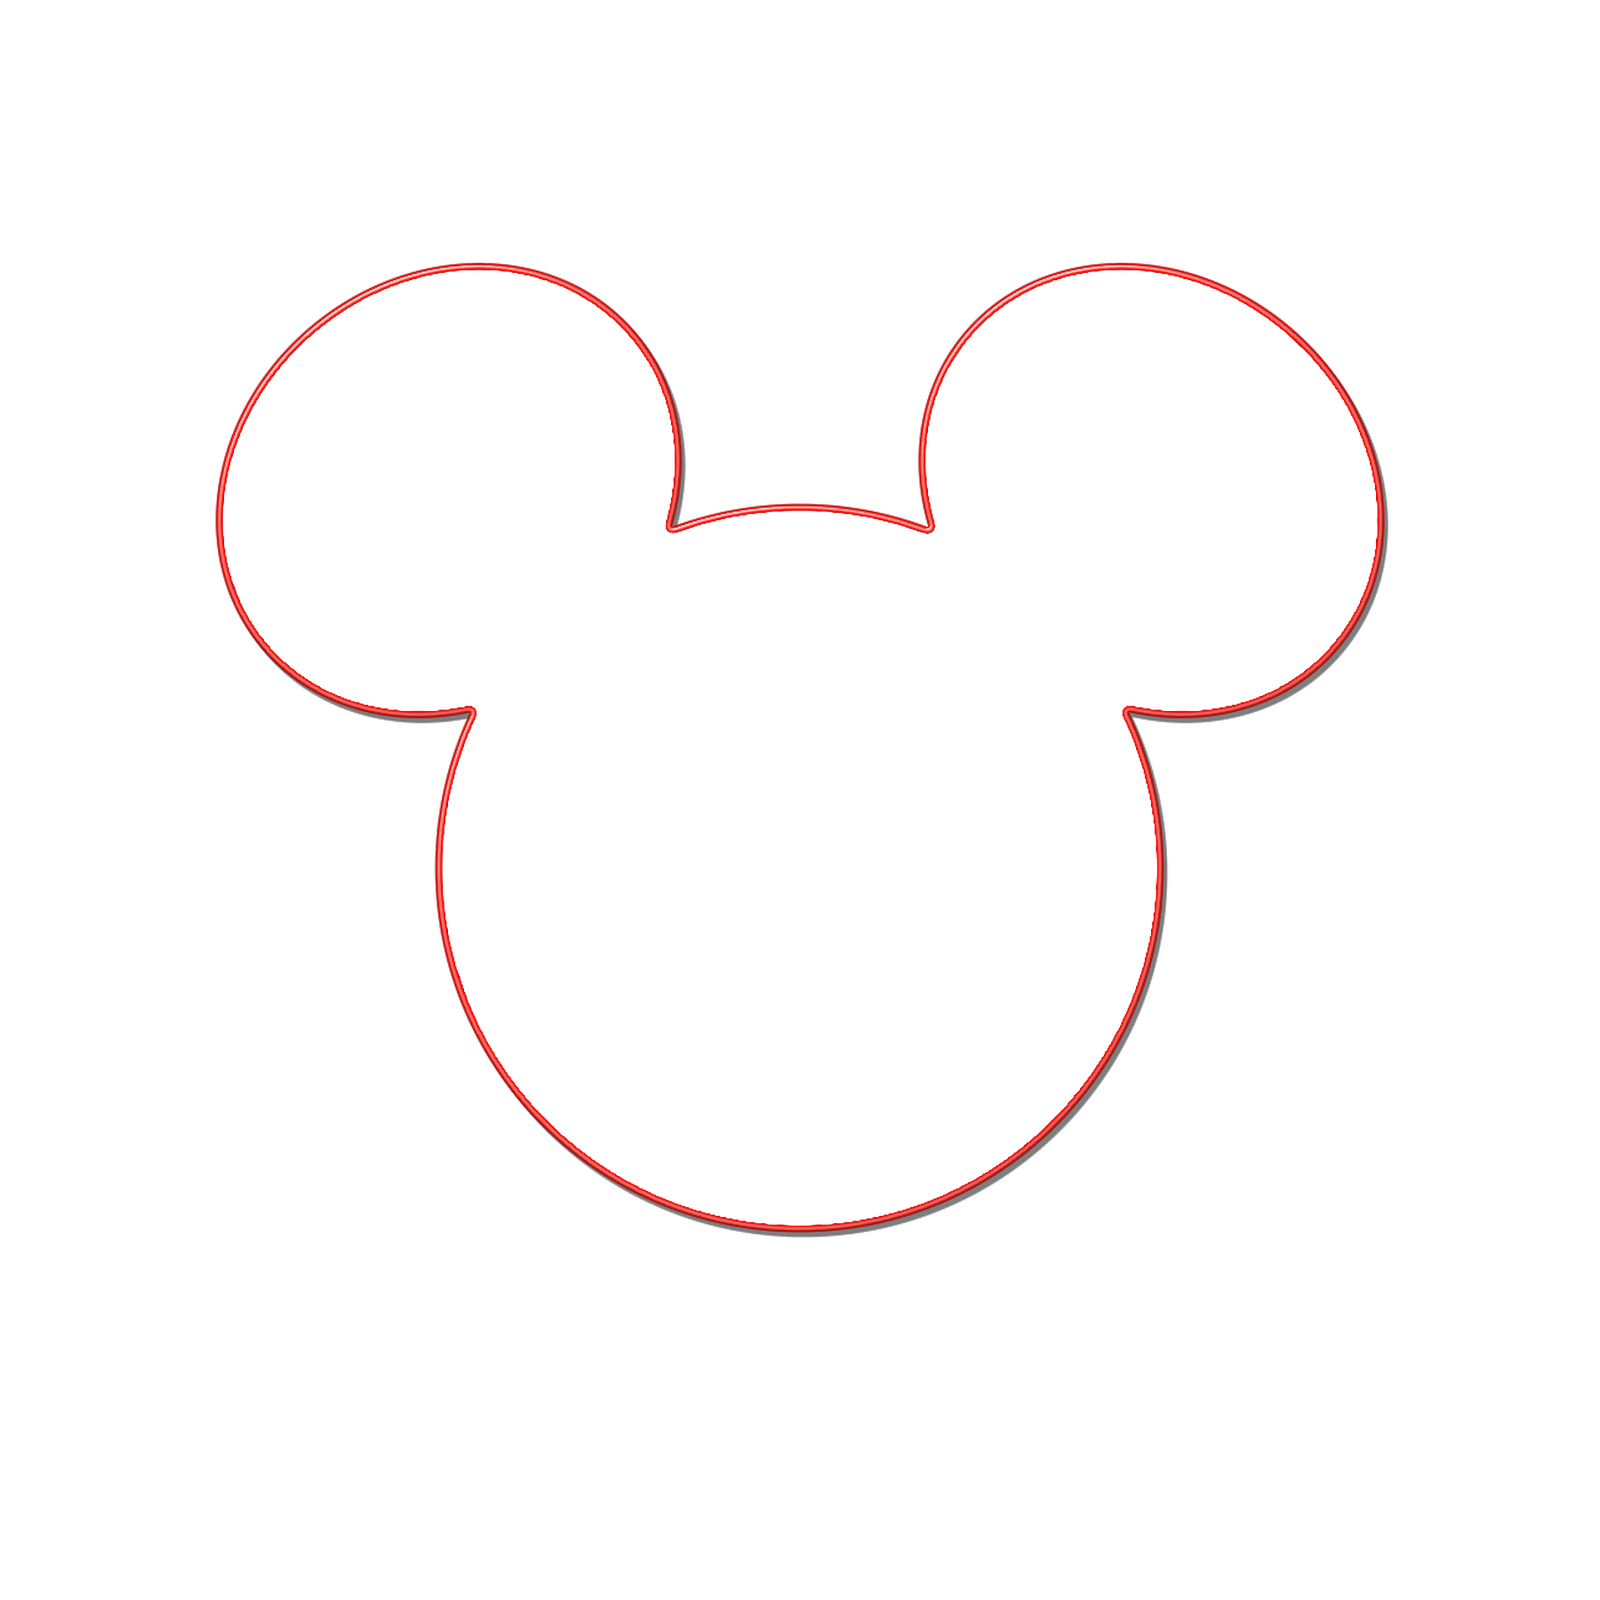 ... Iu0026#39;m Quite Crafty: Minnie Mou-... Iu0026#39;m Quite Crafty: Minnie Mouse Inspired Sneakers ...-10